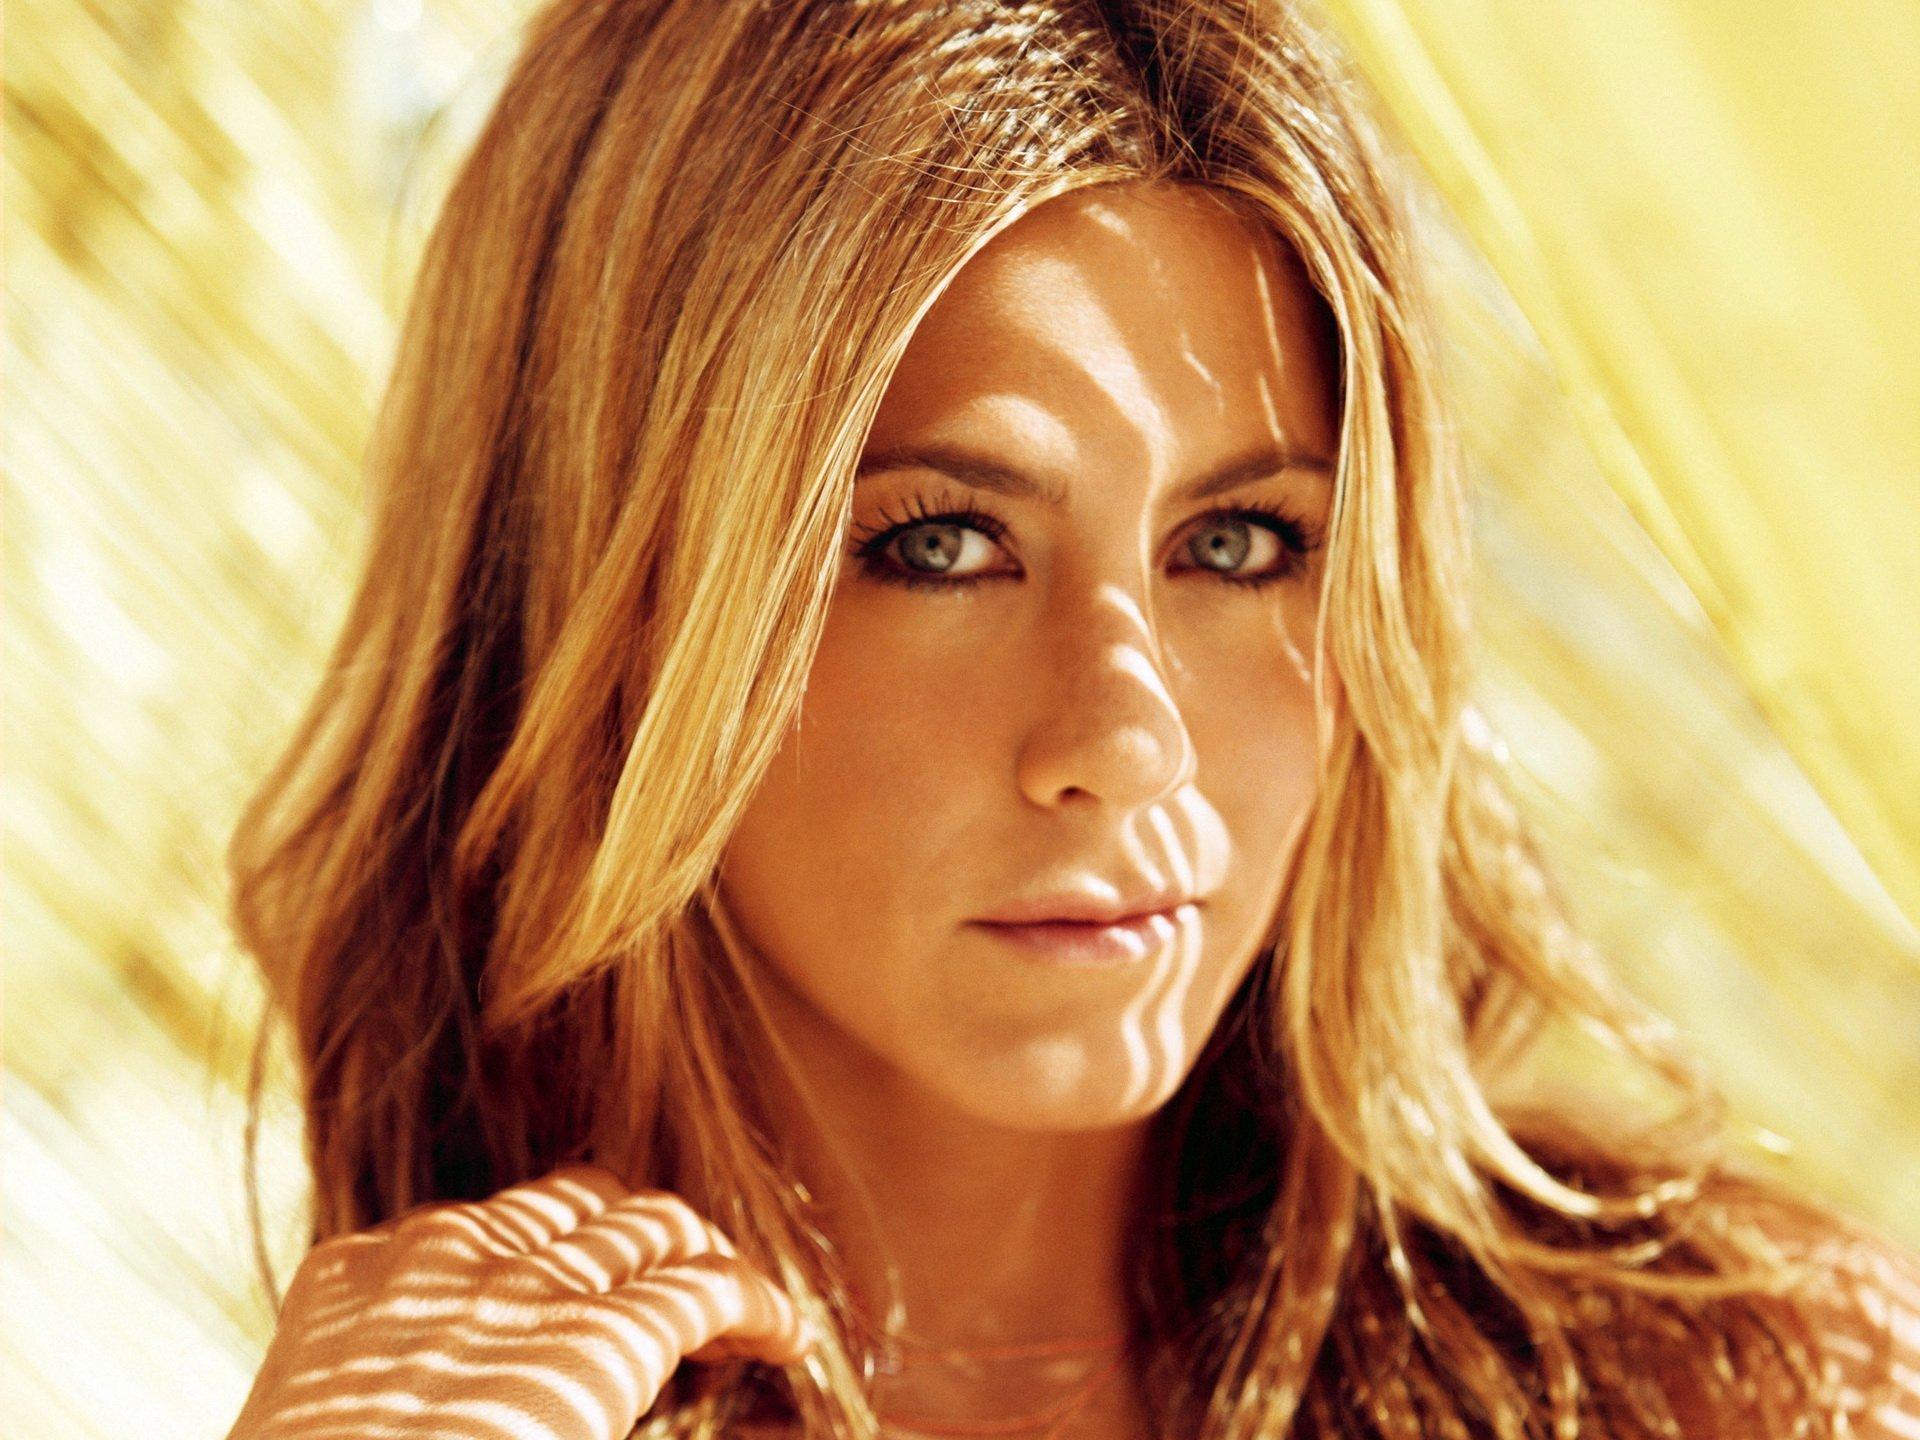 Demandan a Jennifer Aniston por no pagar US$ 43.000